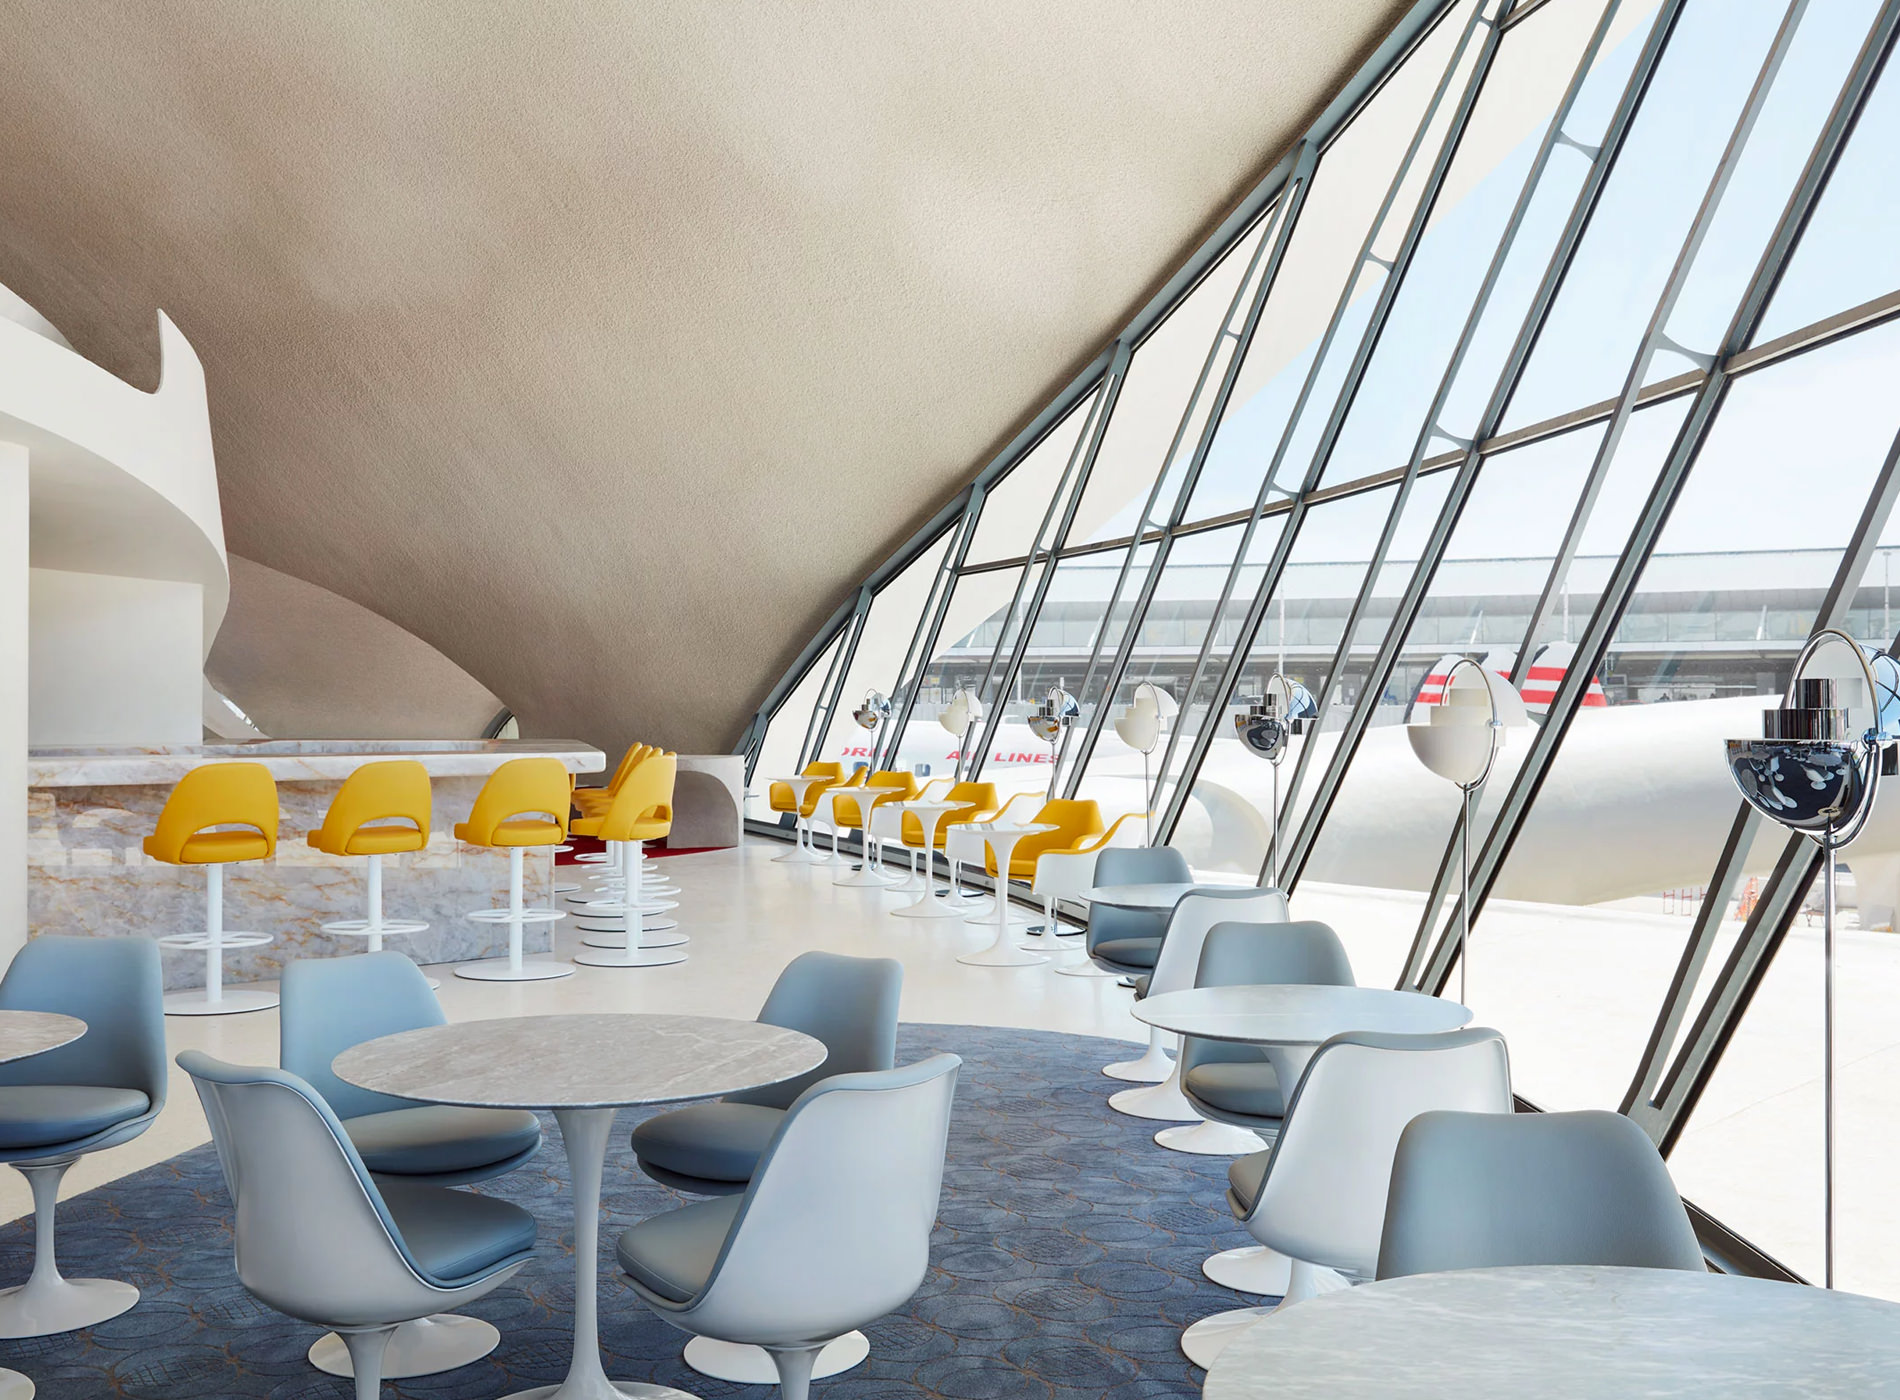 TWA Hotel New York JFK Airport TWA Flight Center Paris Café Lisbon Lounge